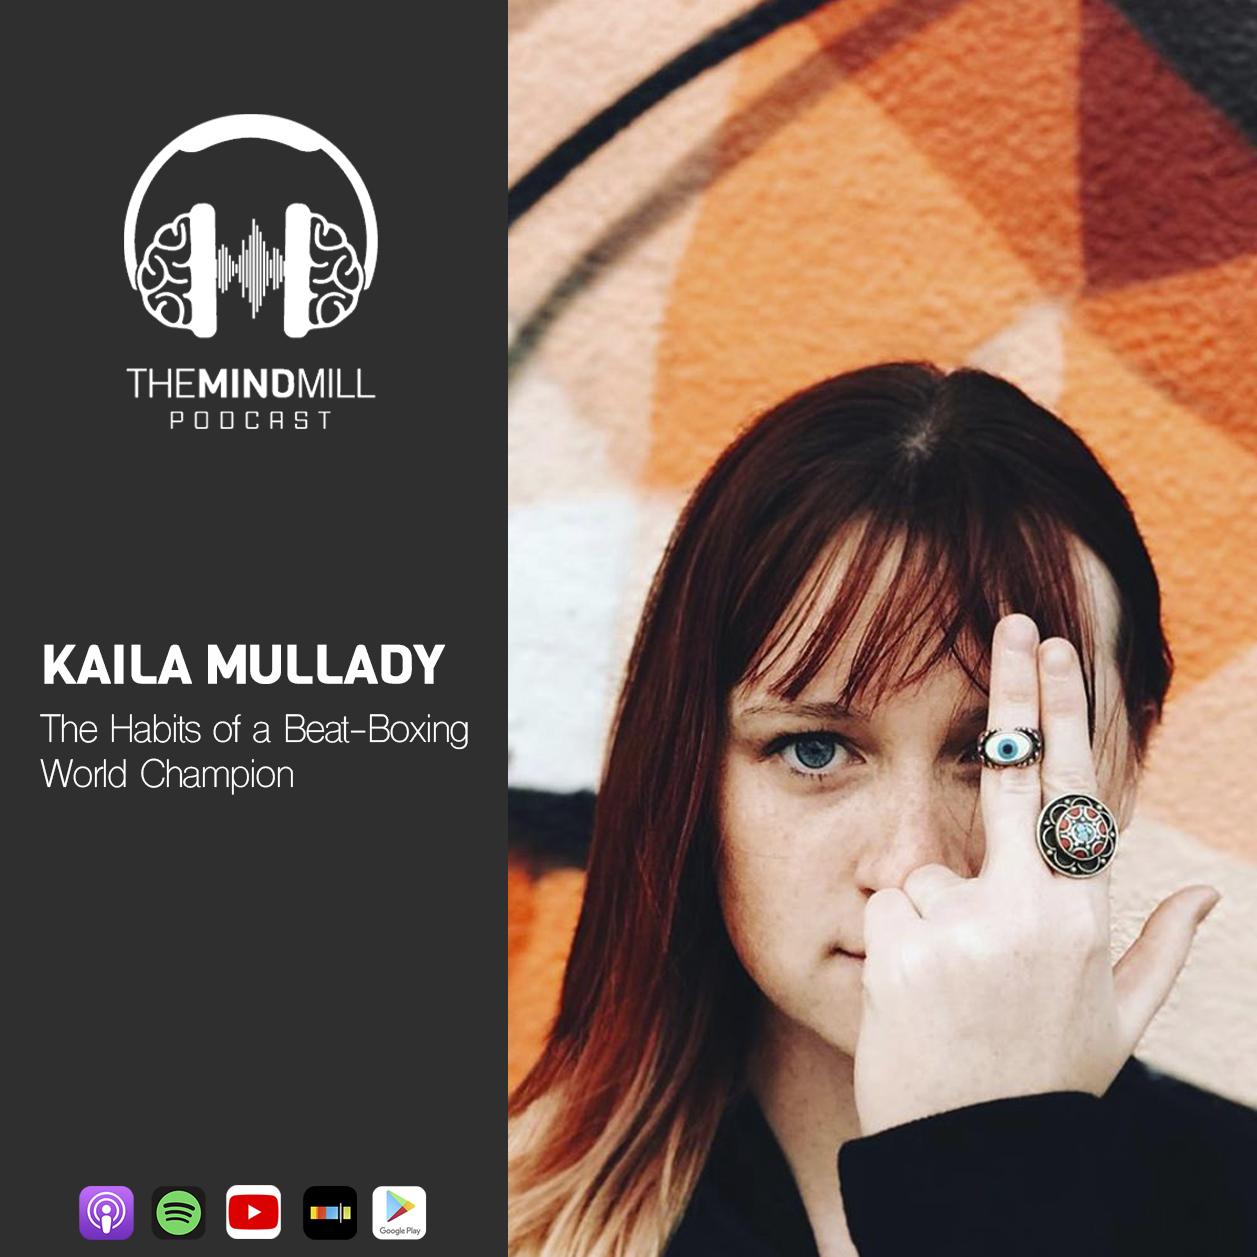 #42: Kaila Mullady | The Habits of a Beat-Boxing World Champion